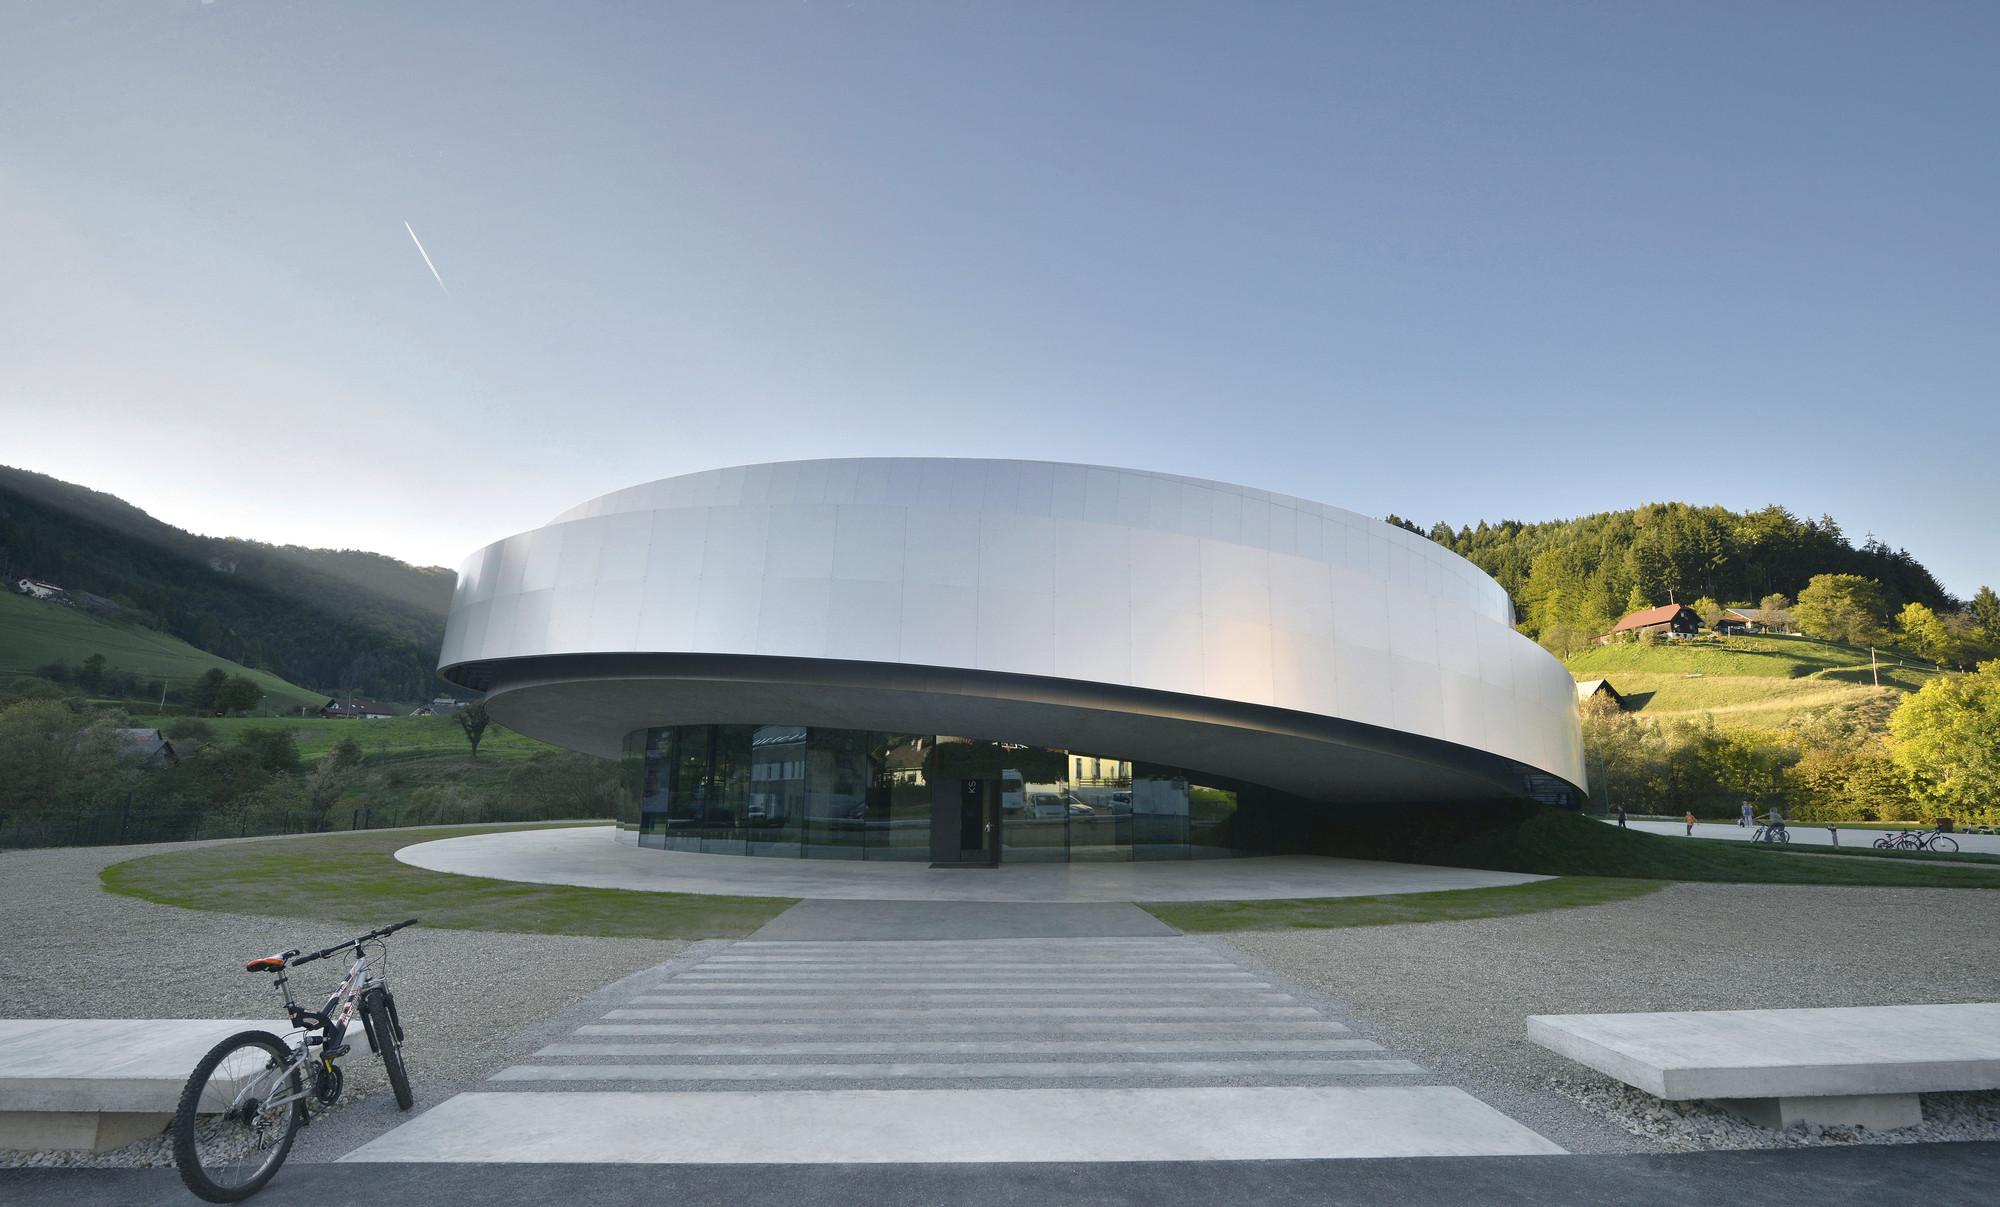 Cultural Center of EU Space Technologies / Dekleva Gregoric Arhitekti + SADAR + VUGA + OFIS architects + Bevk Perovic Arhitekti, © Tomaz Gregoric